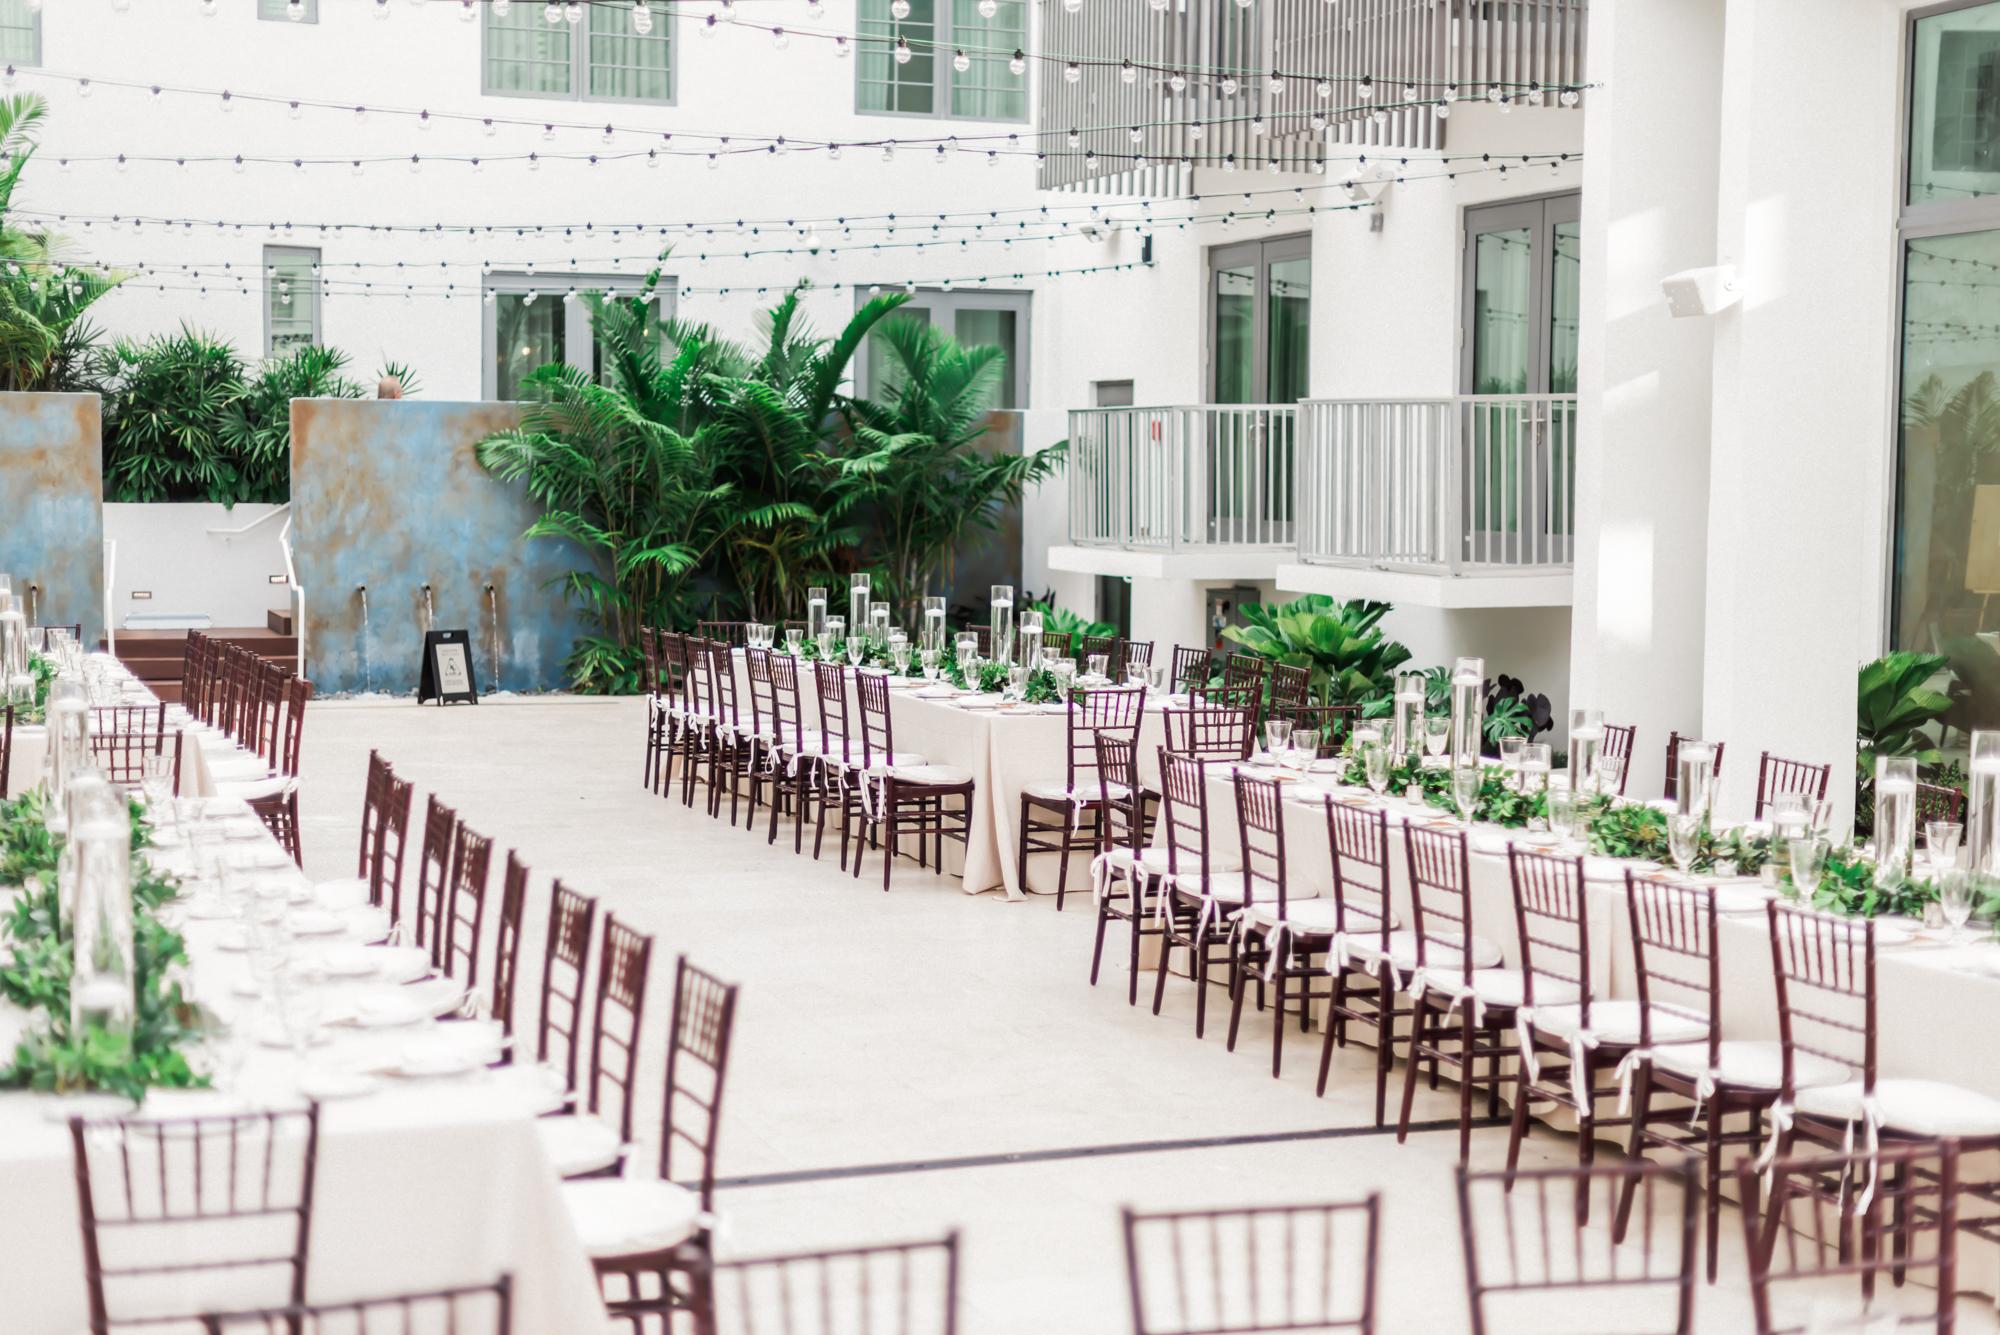 betsy-hotel-wedding-south-beach-miami-charleston-south-carolina-destination-wedding-photographer-28.jpg